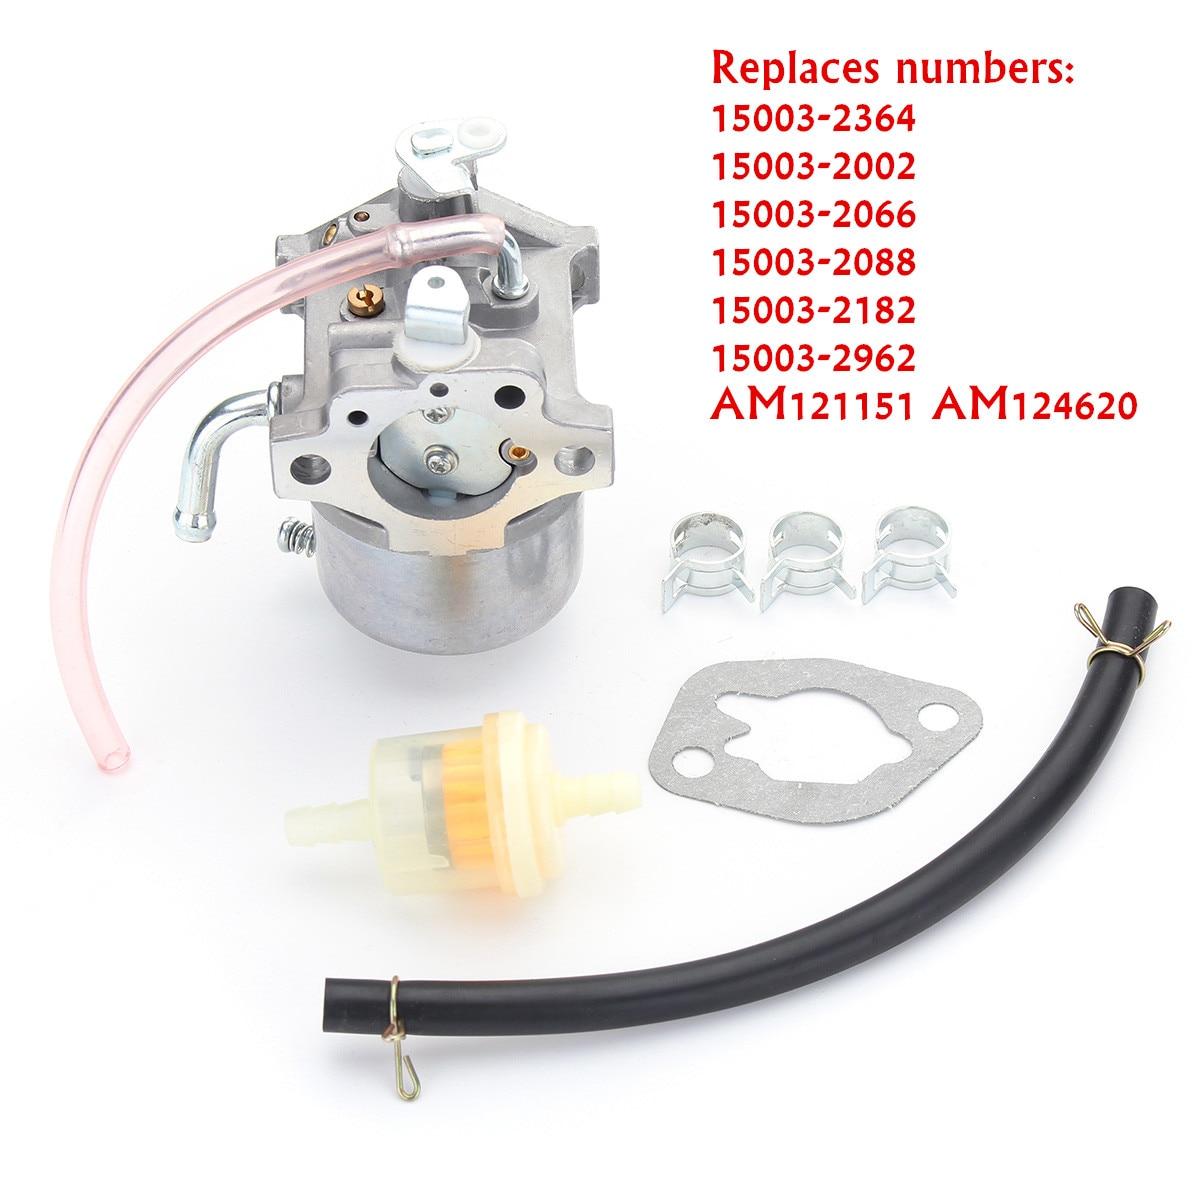 Carburetor For Kawasaki FC150V 4 Stroke Engine John Deere 14SB Mower # AM124620